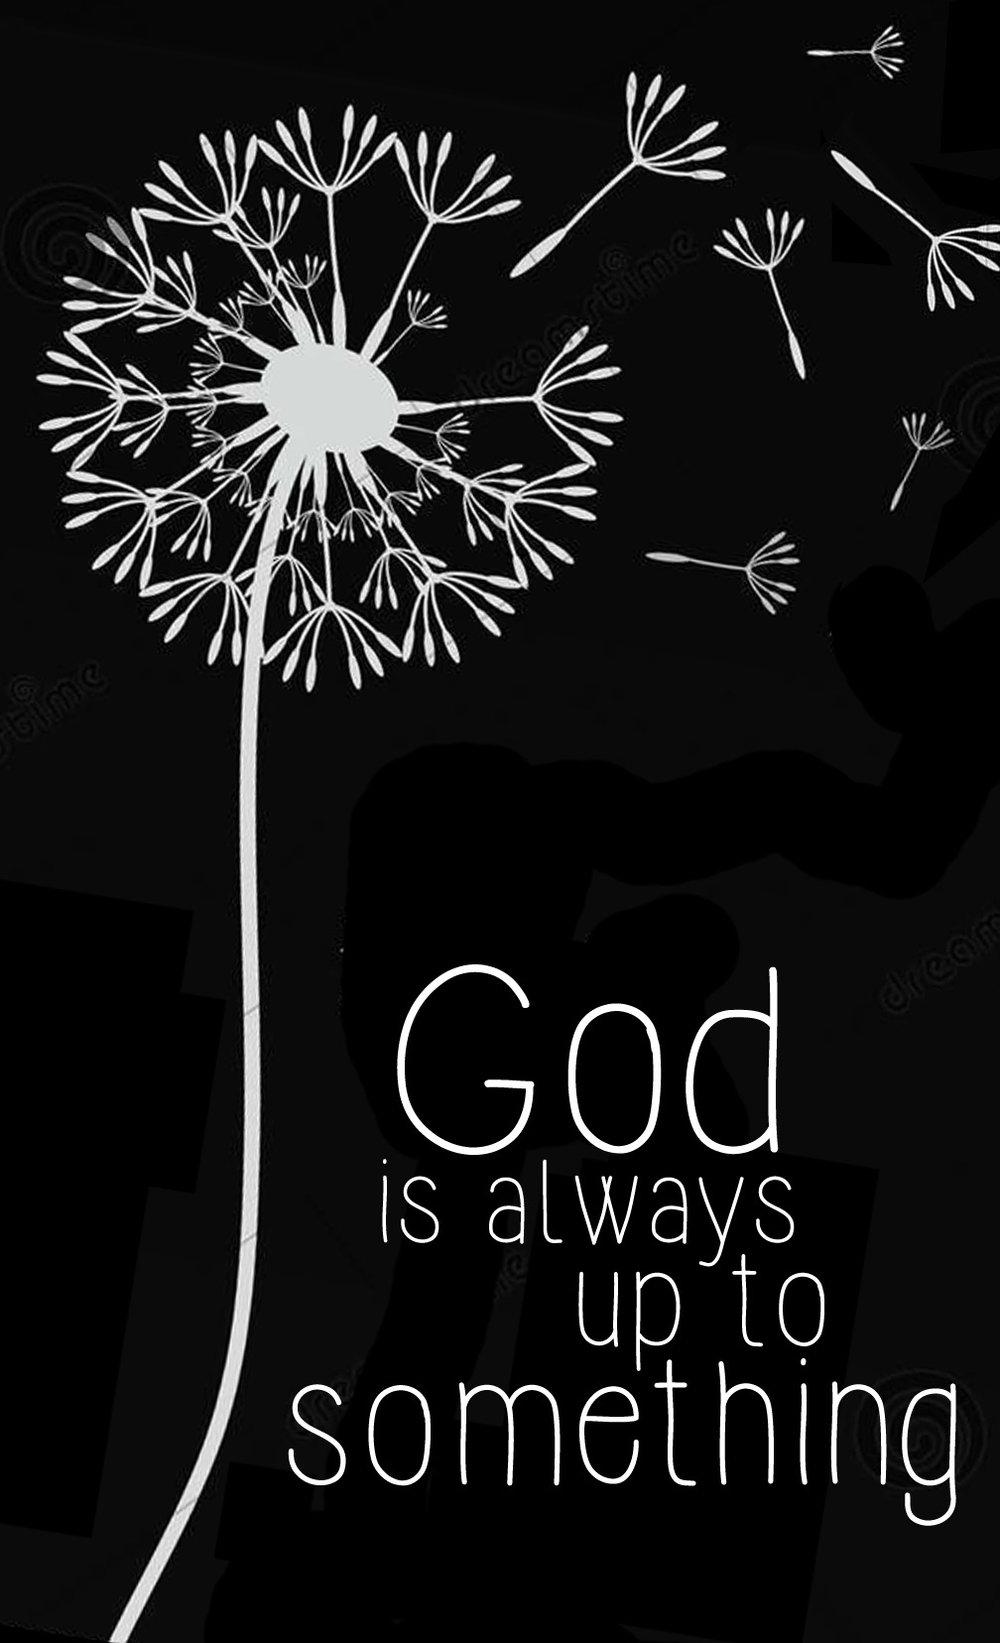 Spiritual // God is Up to Something // 14x23 // $65